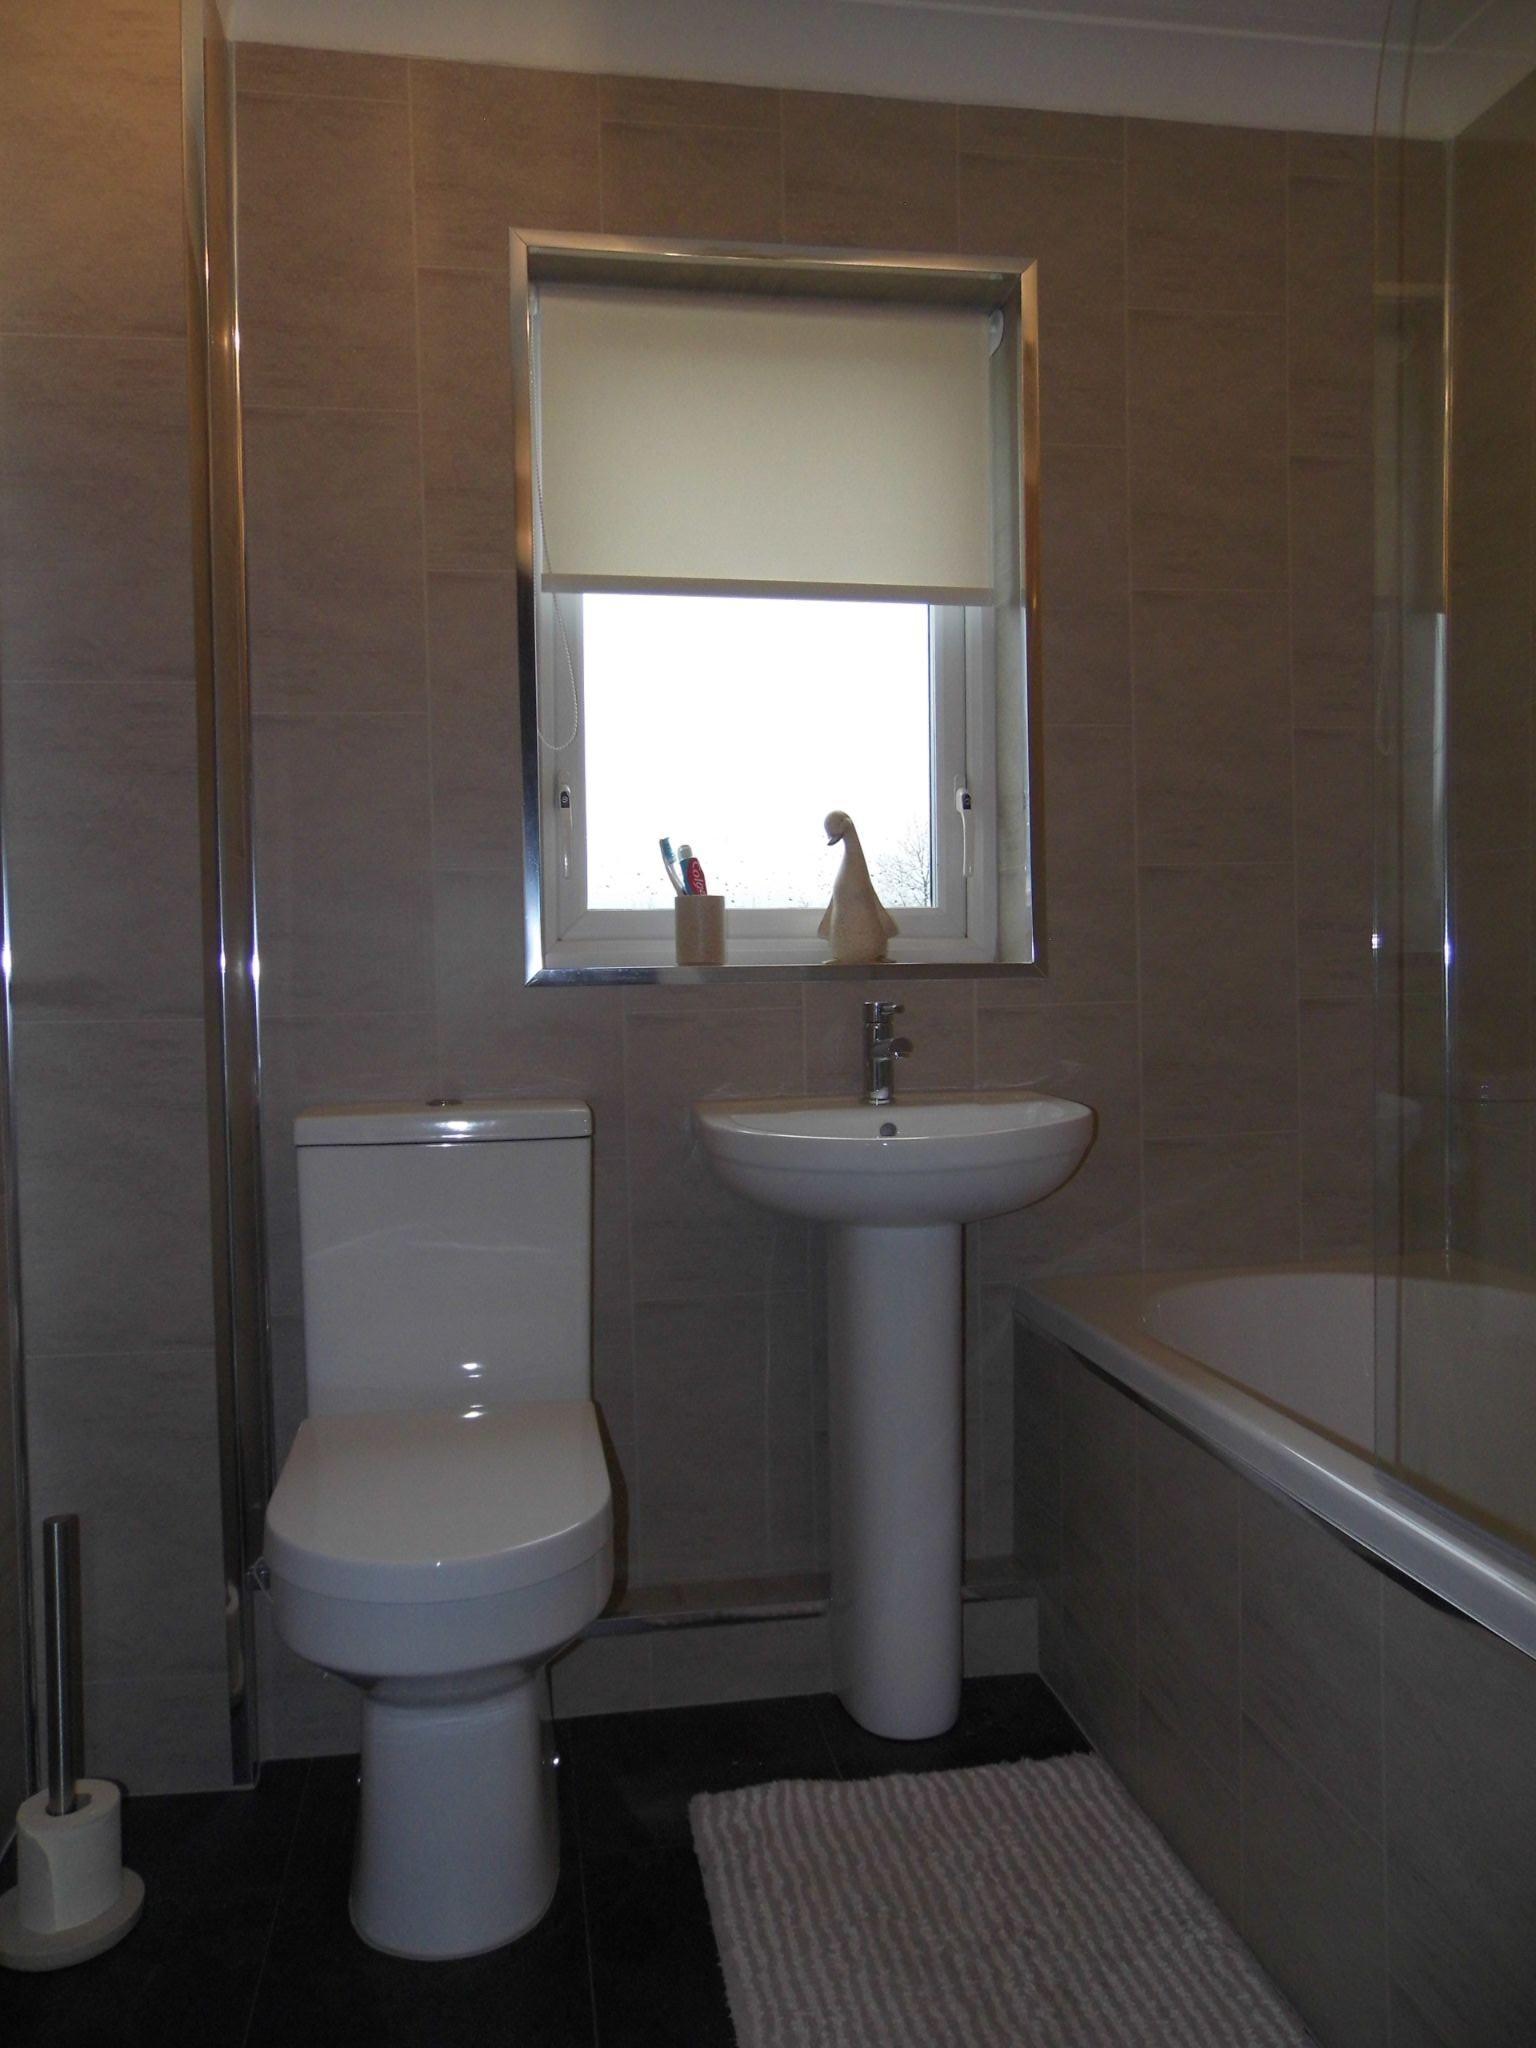 4 bedroom detached house SSTC in Bishop Auckland - Family Bathroom.